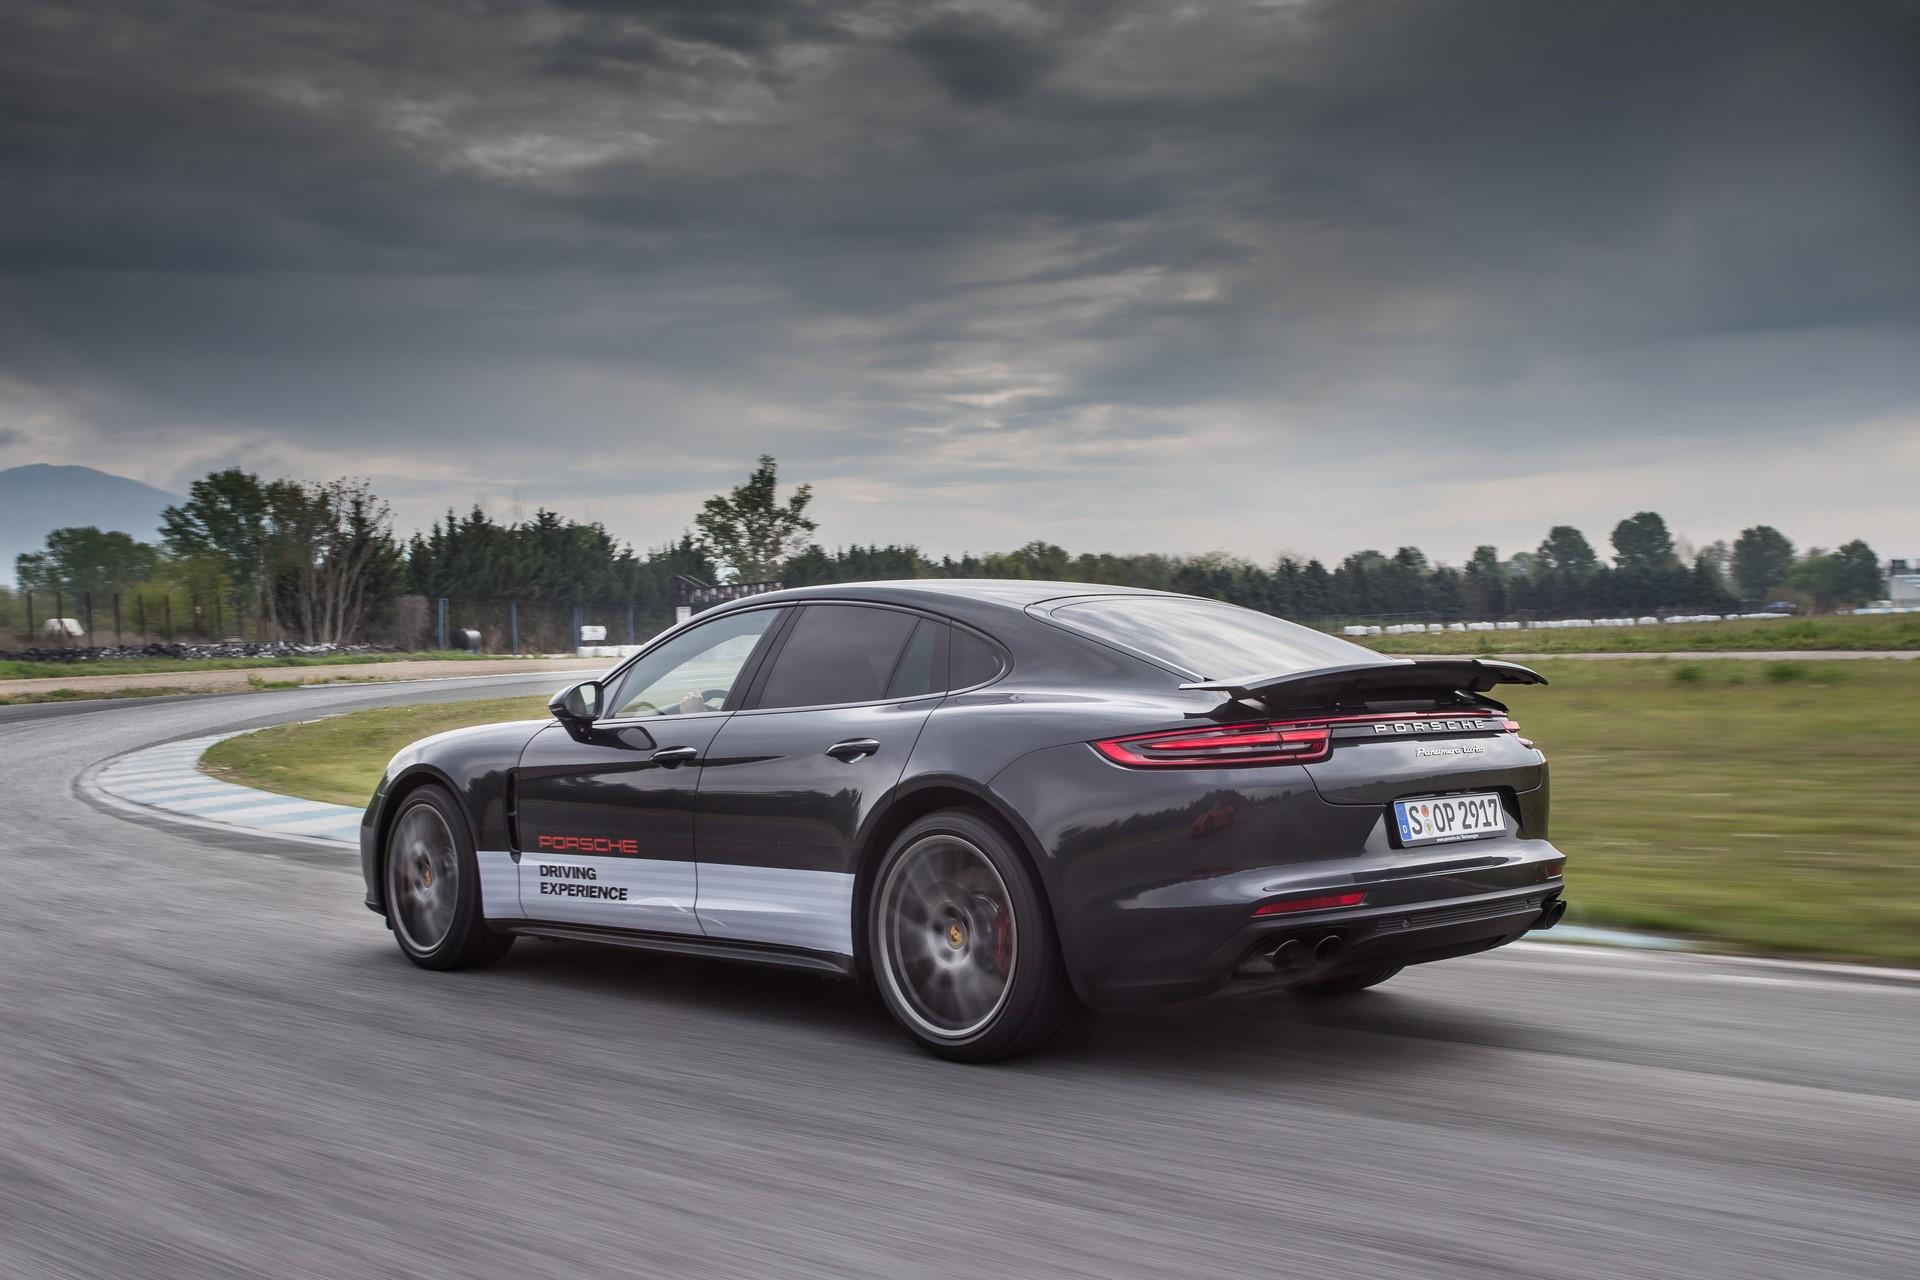 Porsche Driving Experience 2017 Serres (49)